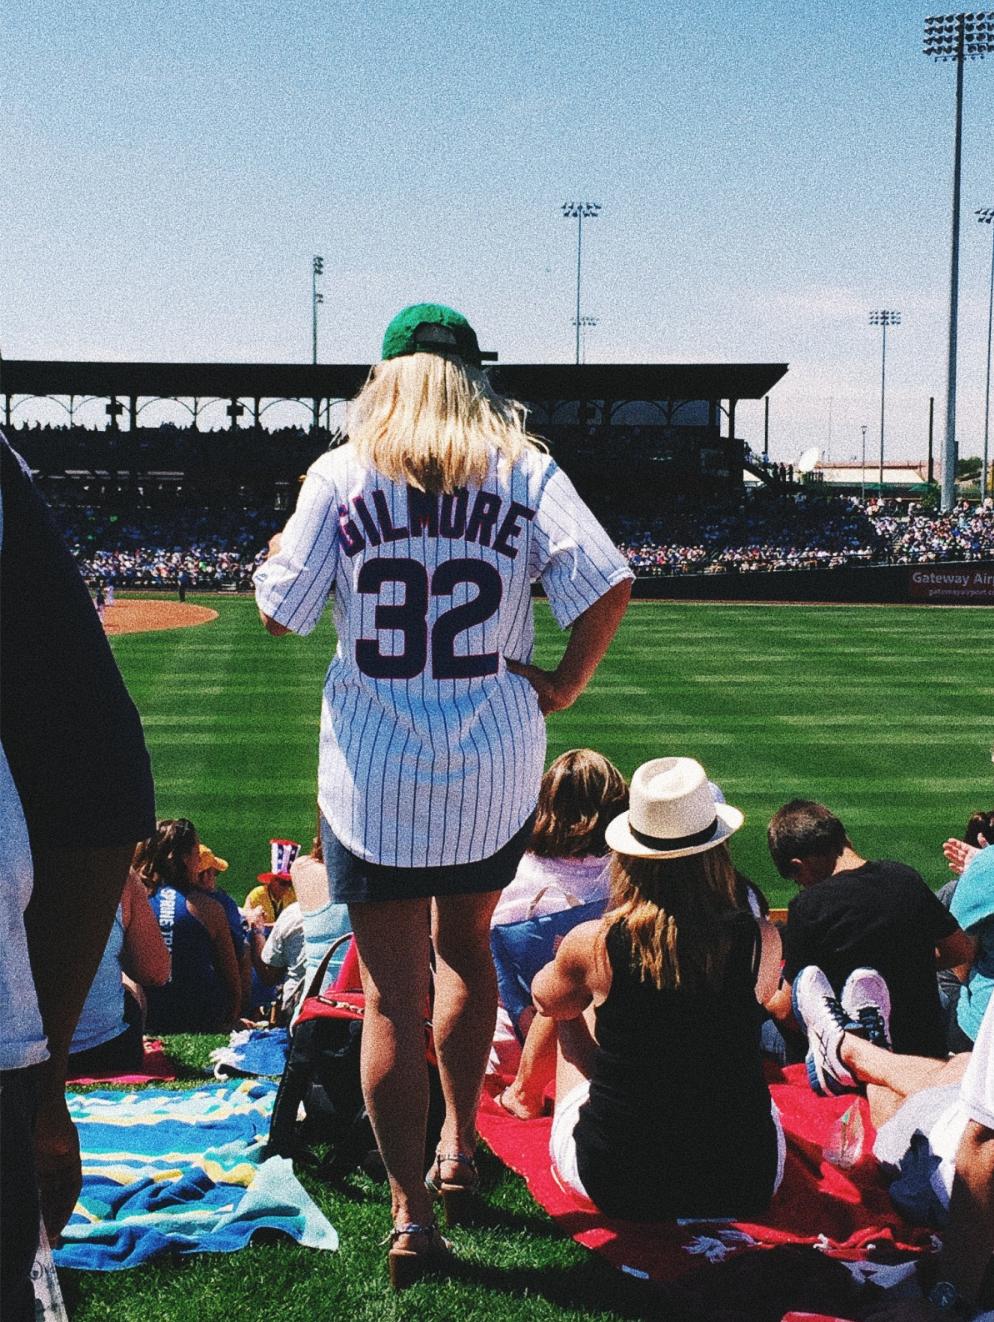 cubs, baseball, arizona, gilmore, jersey, field